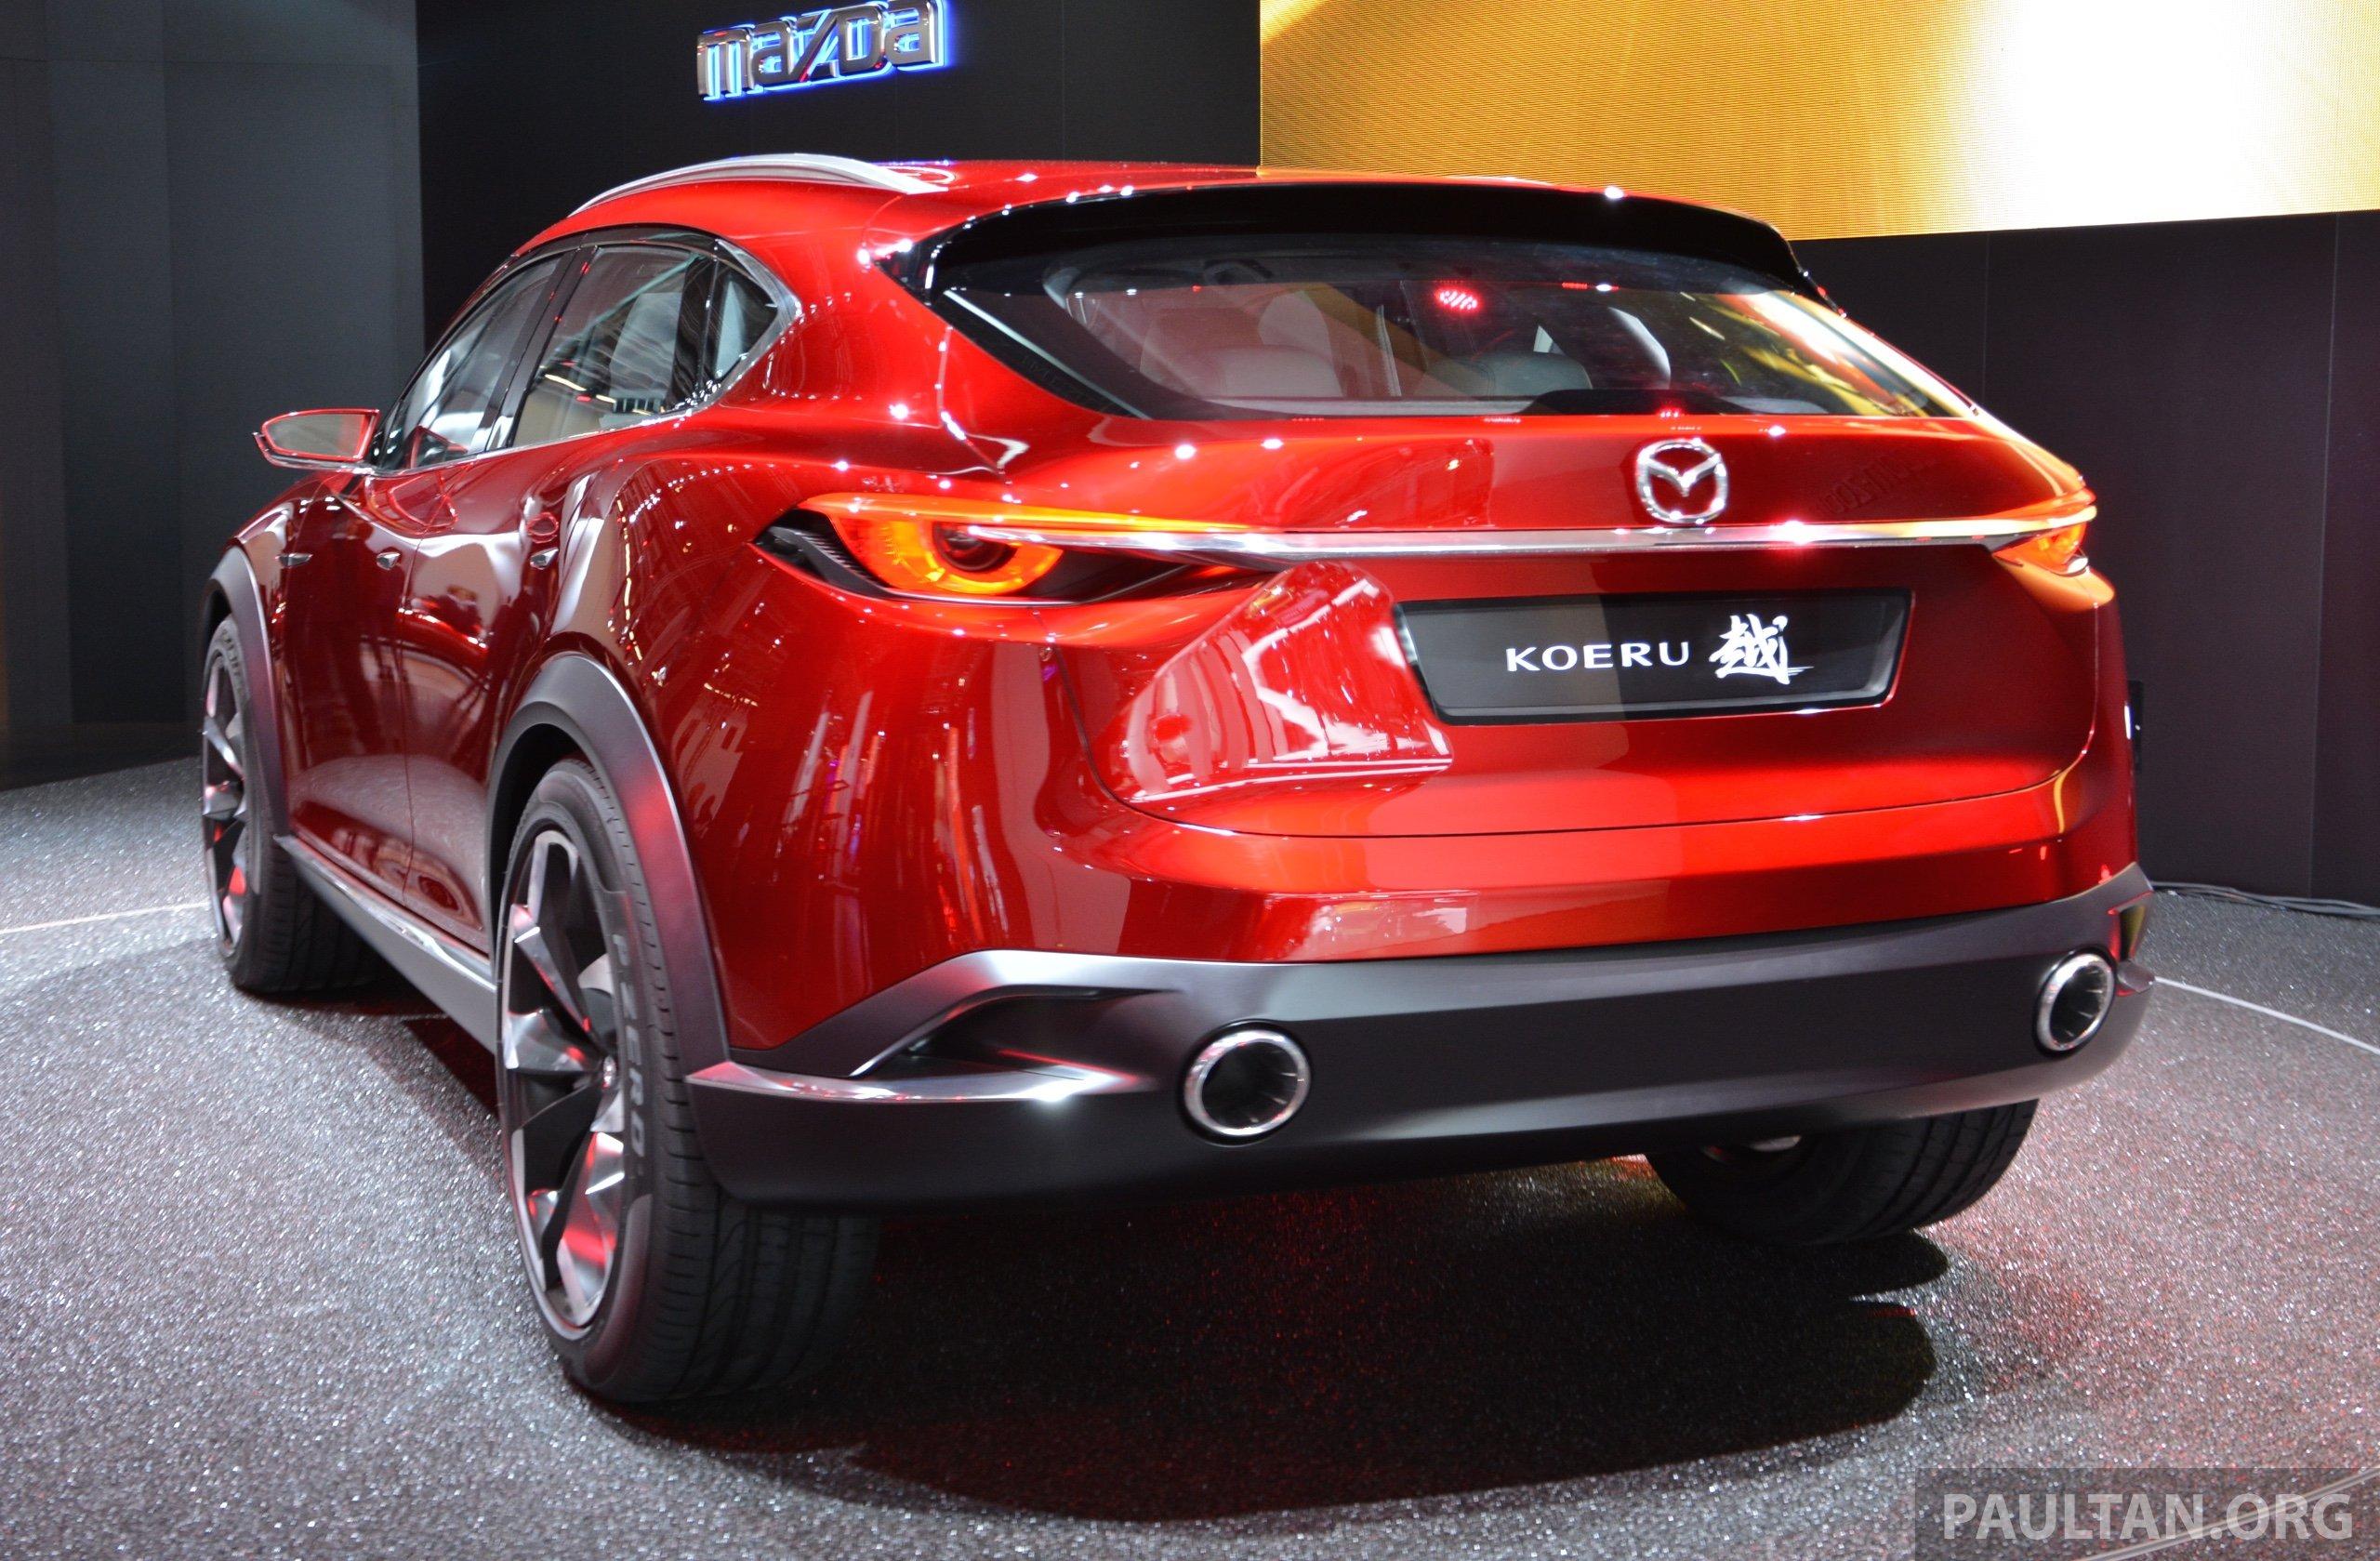 Mazda Koeru concept previews a sportier CX-5 SUV? Image 380241